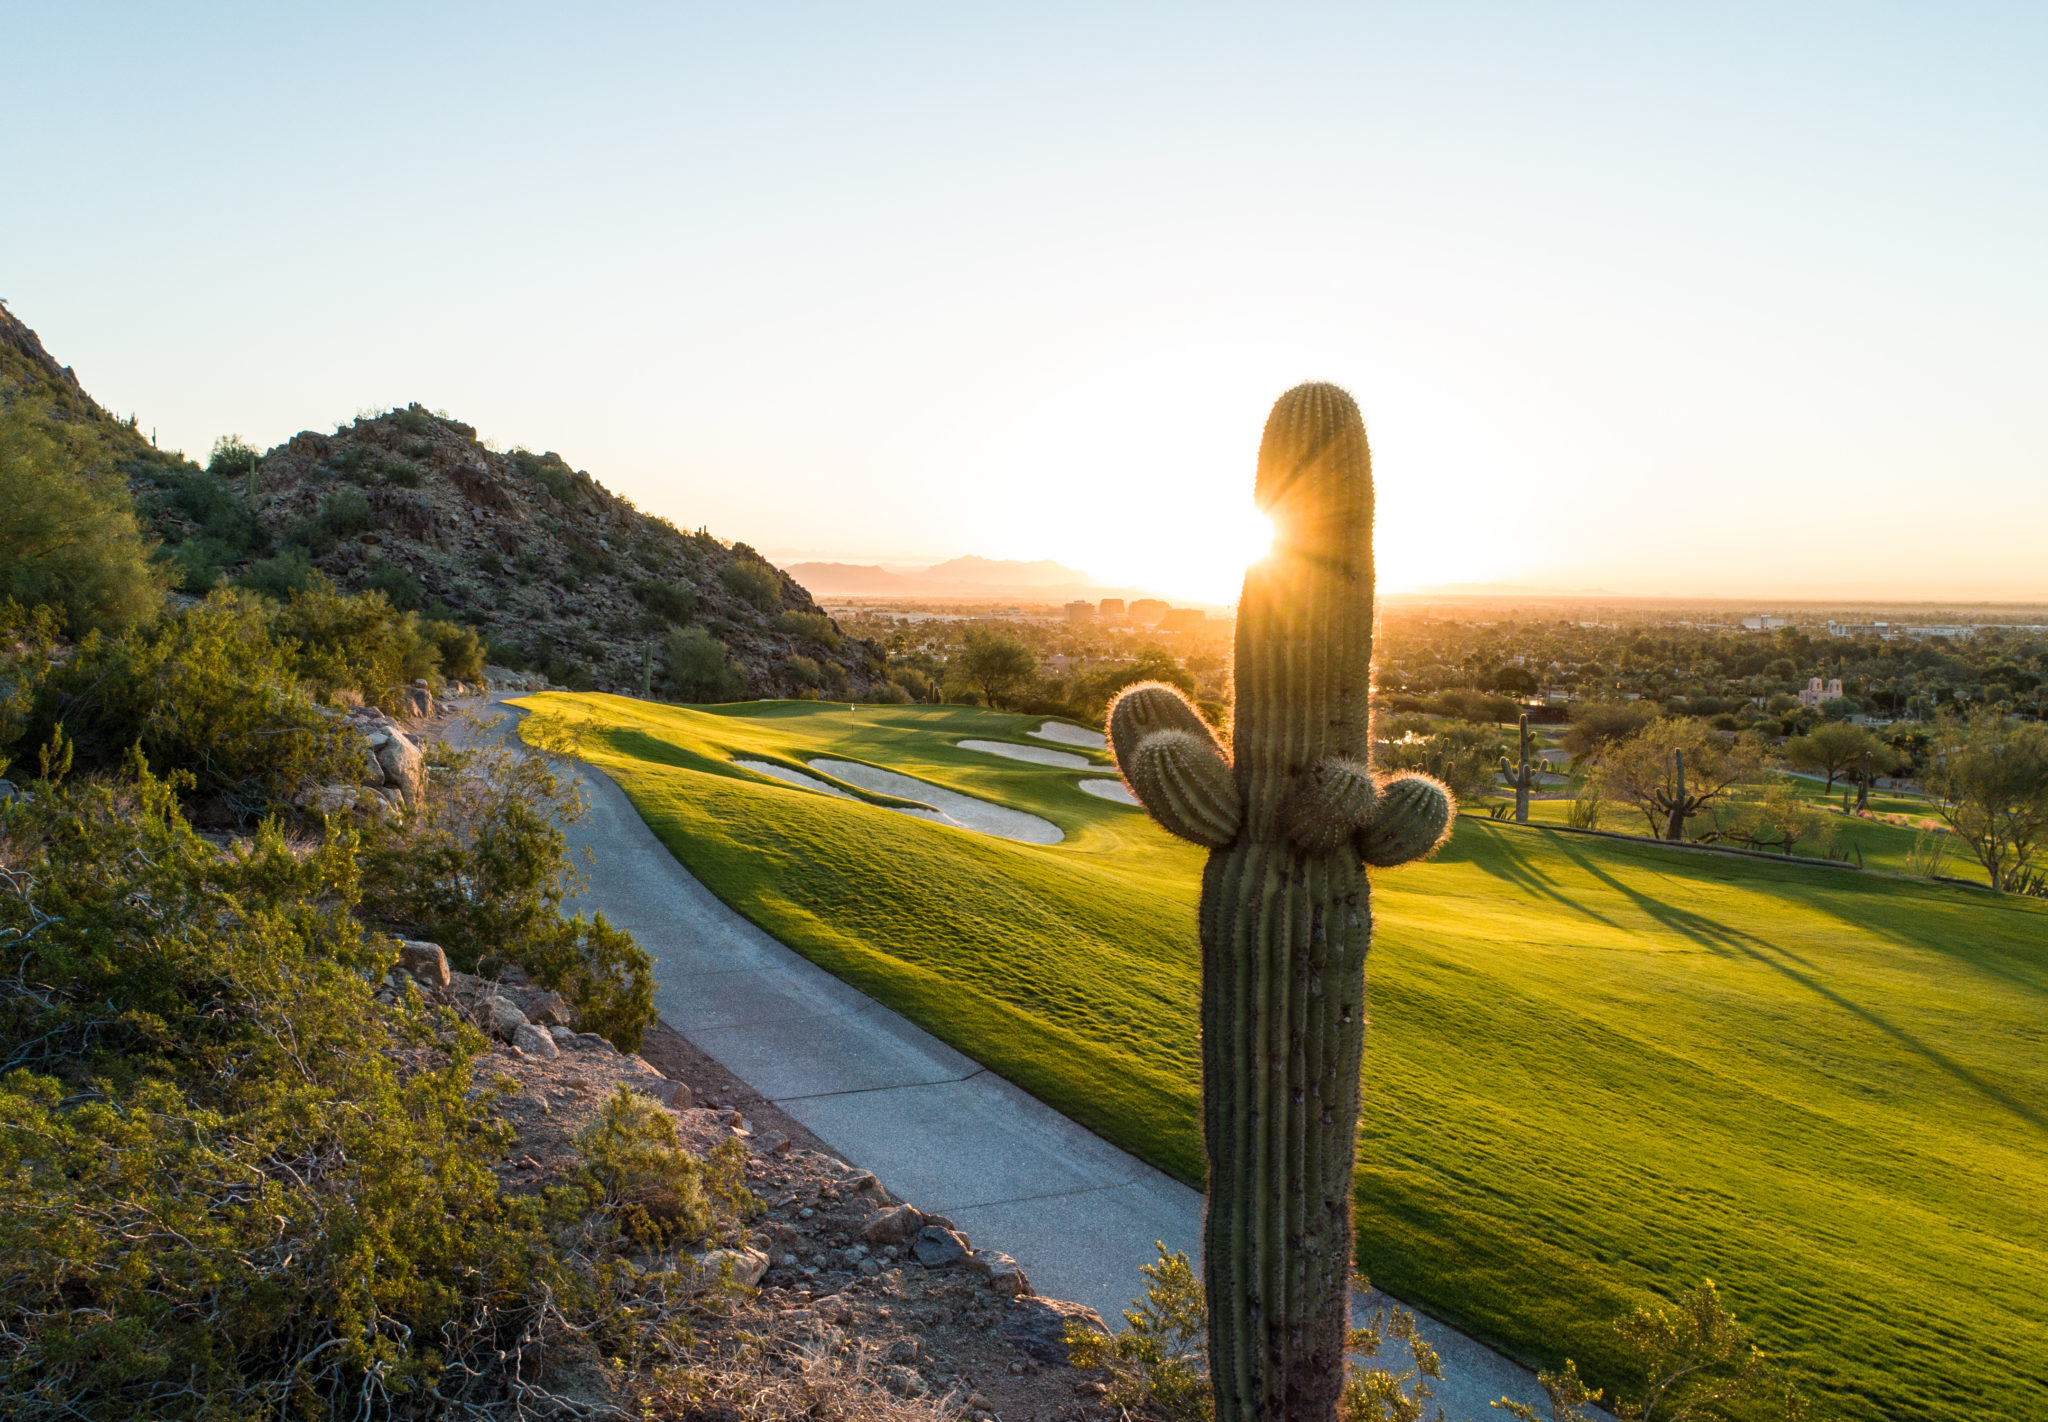 The Phoenician–Scottsdale, Arizona